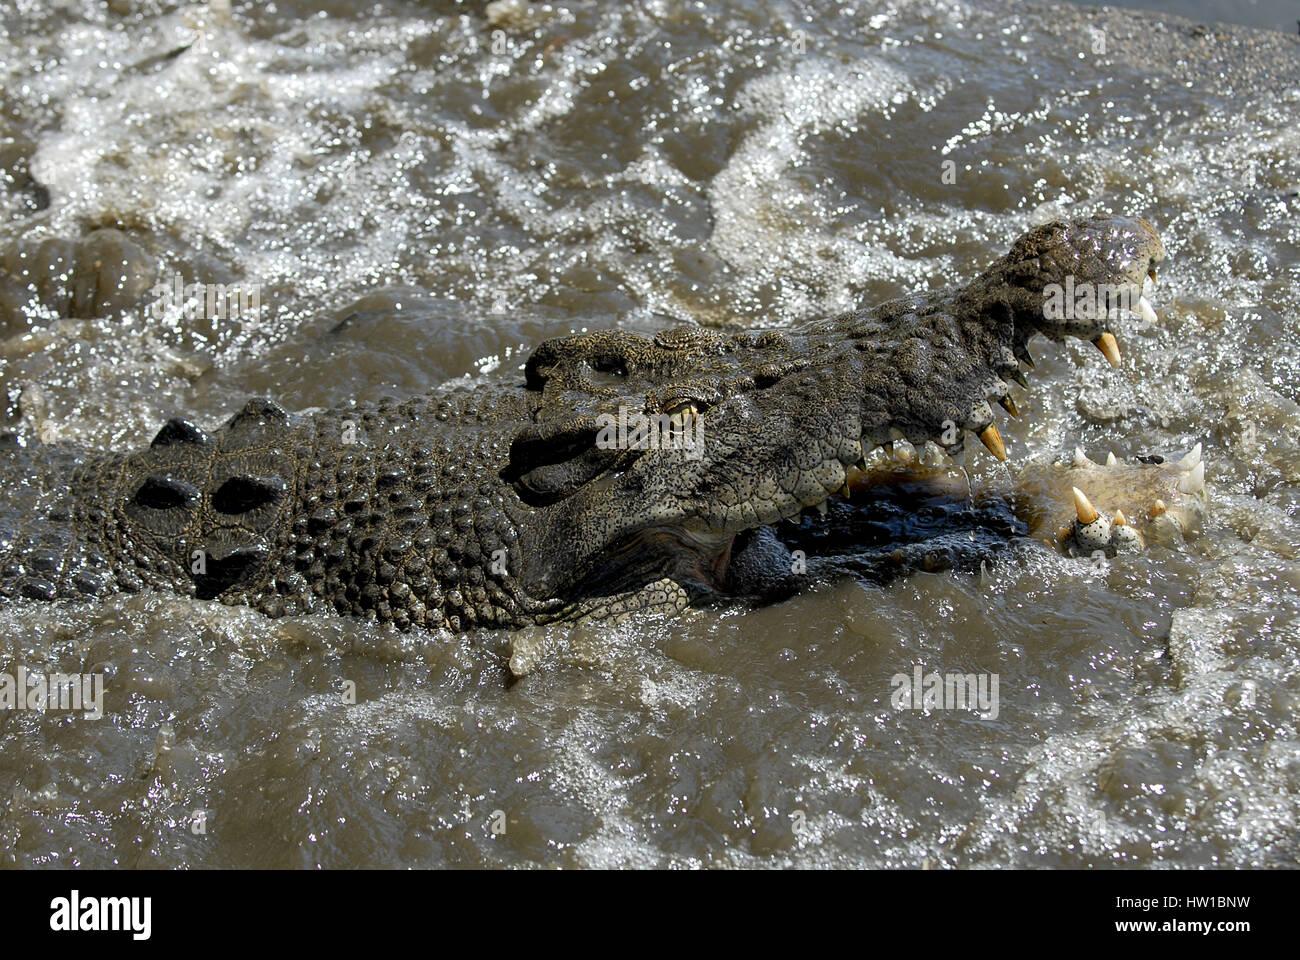 Crocodile, Krokodil Stock Photo